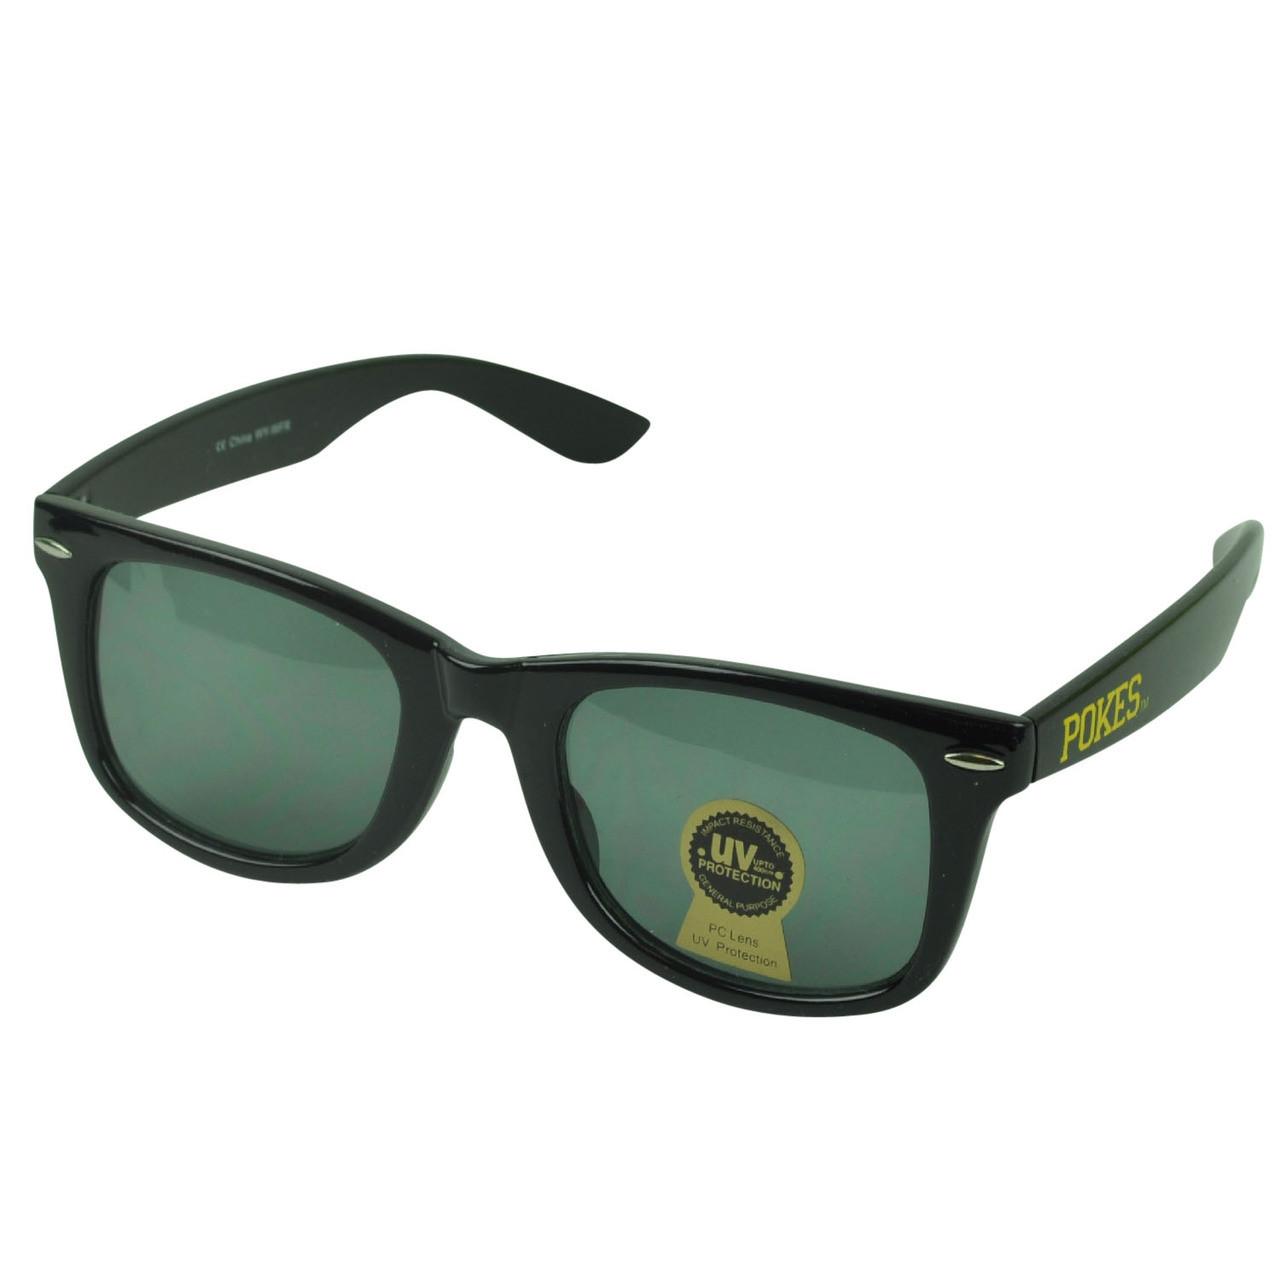 NCAA Wyoming Cowboys Pokes Wayfarer Style Shade Sunglasses Glasses Plastic  Black